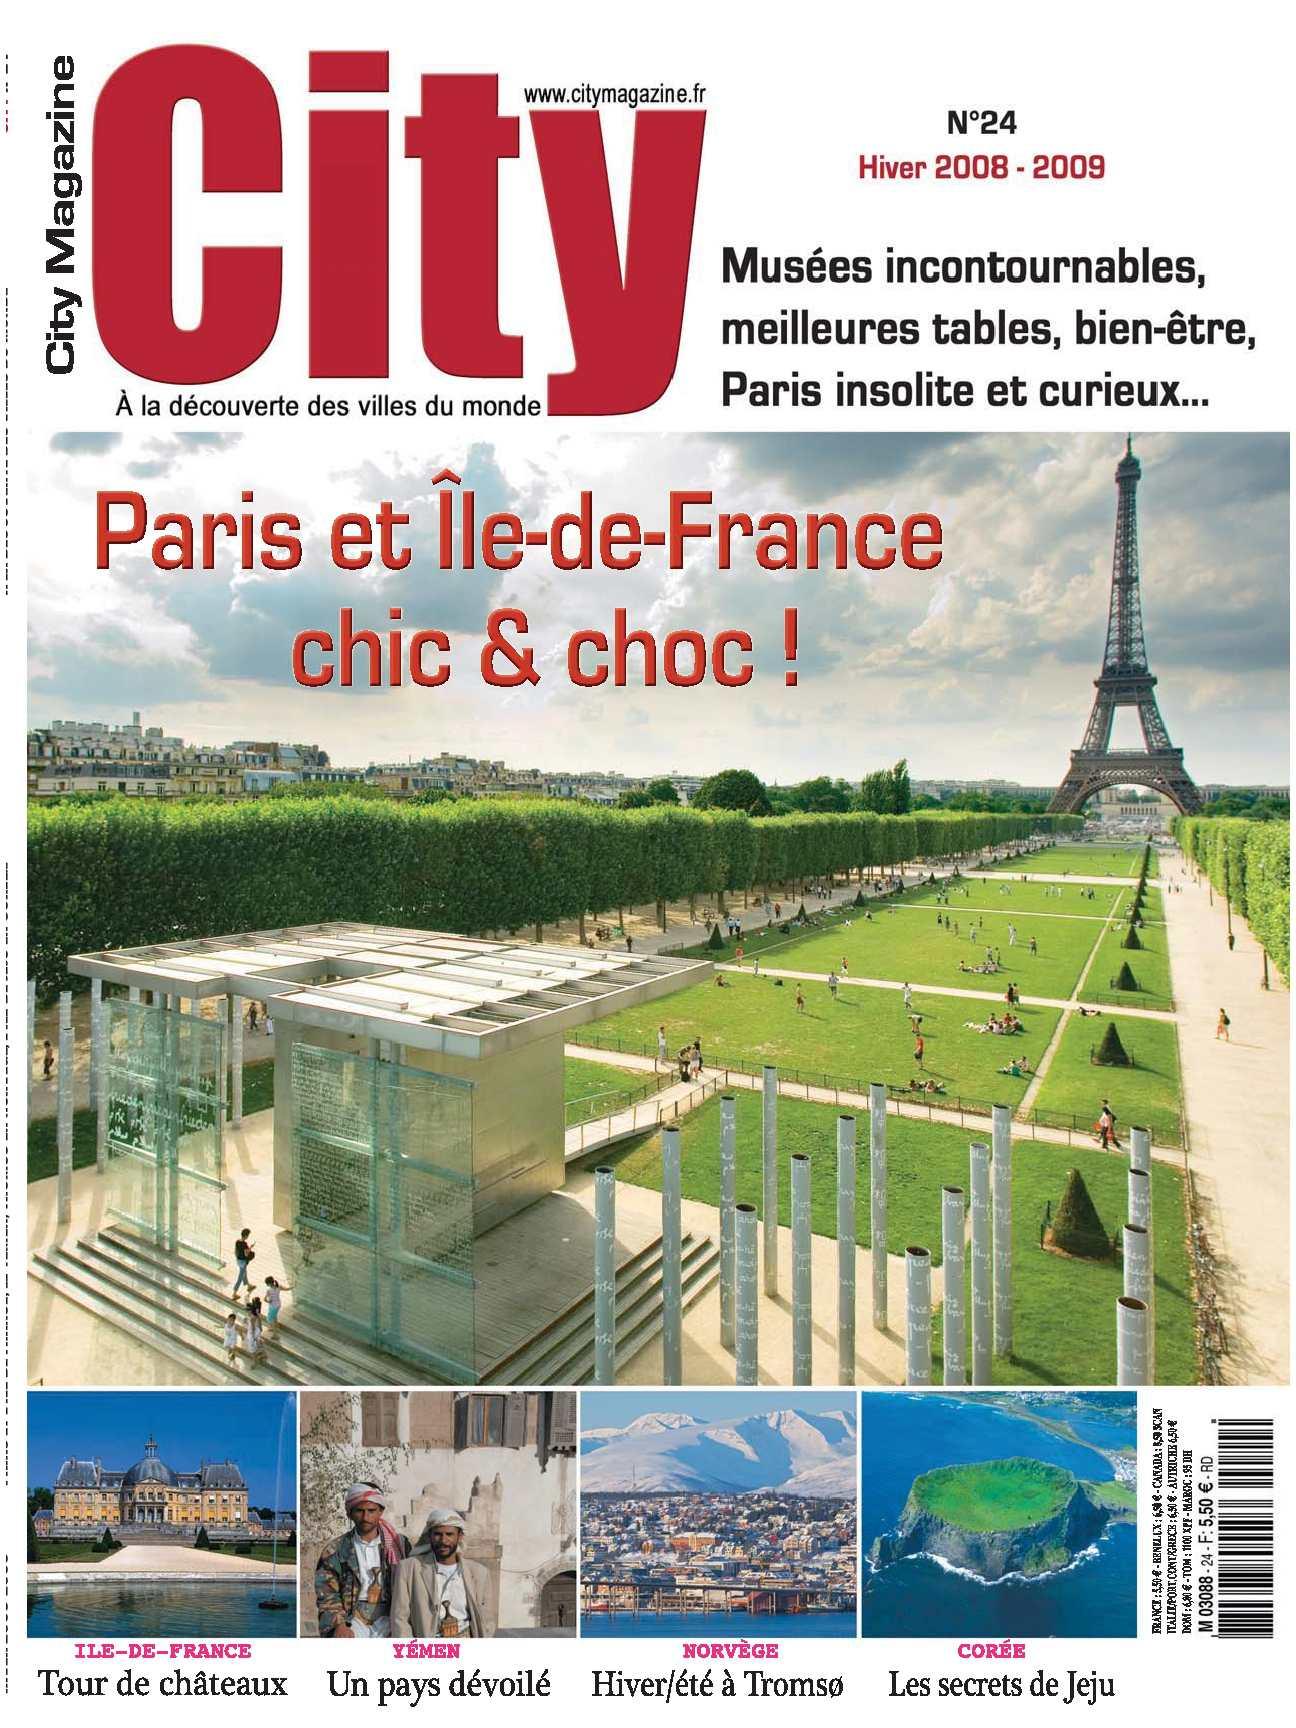 N°24 N°24 Calaméo Mag Mag Calaméo City City City Calaméo wPN80XZnkO